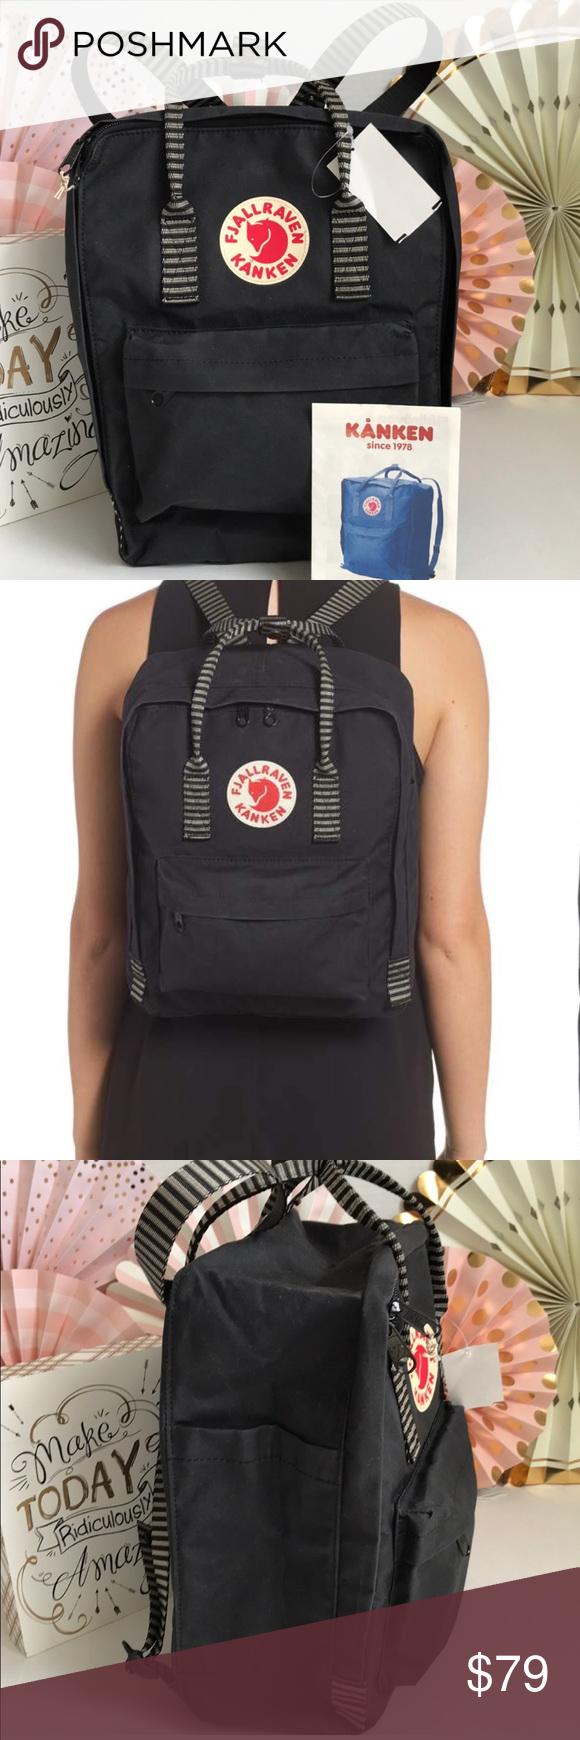 fc9bd6ed6 NEW Fjallraven Kanken Backpack 🎒 11 1/2